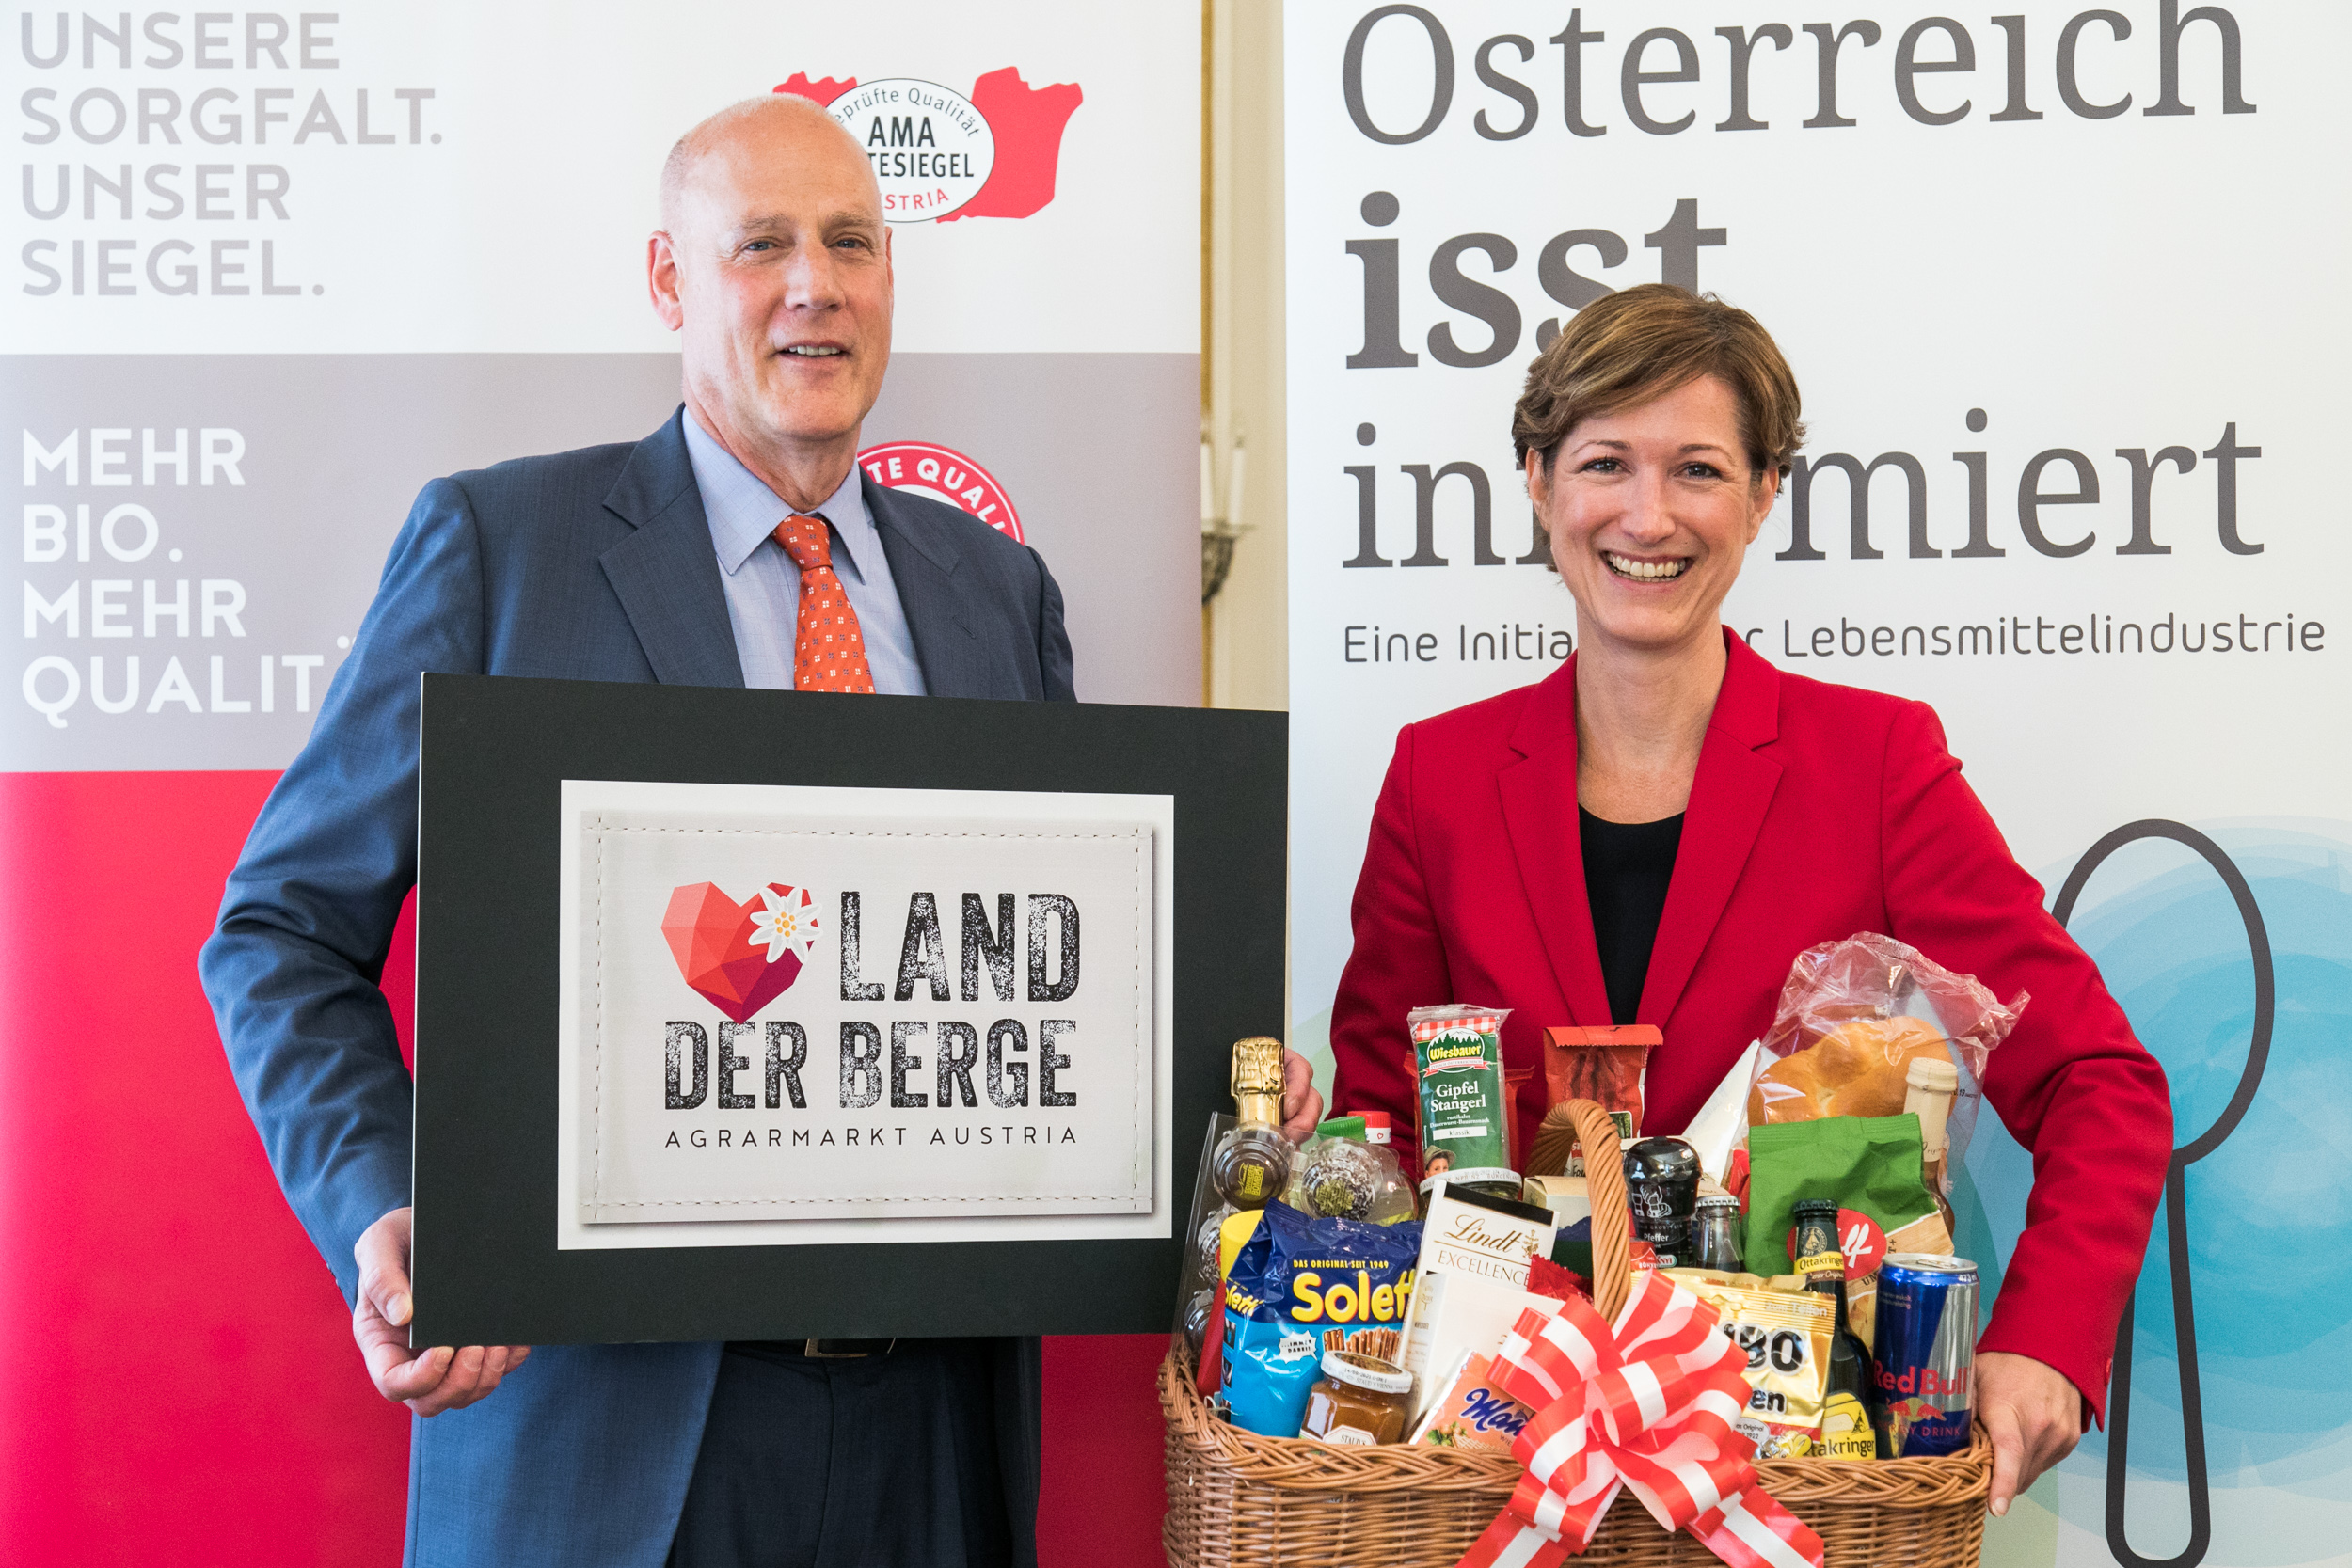 https://www.apa-fotoservice.at/galerie/20739 Im Bild v.l.n.r.: Michael BLASS (AMA-Marketing), Katharina KOSSDORFF (Fachverband der Lebensmittelindustrie)